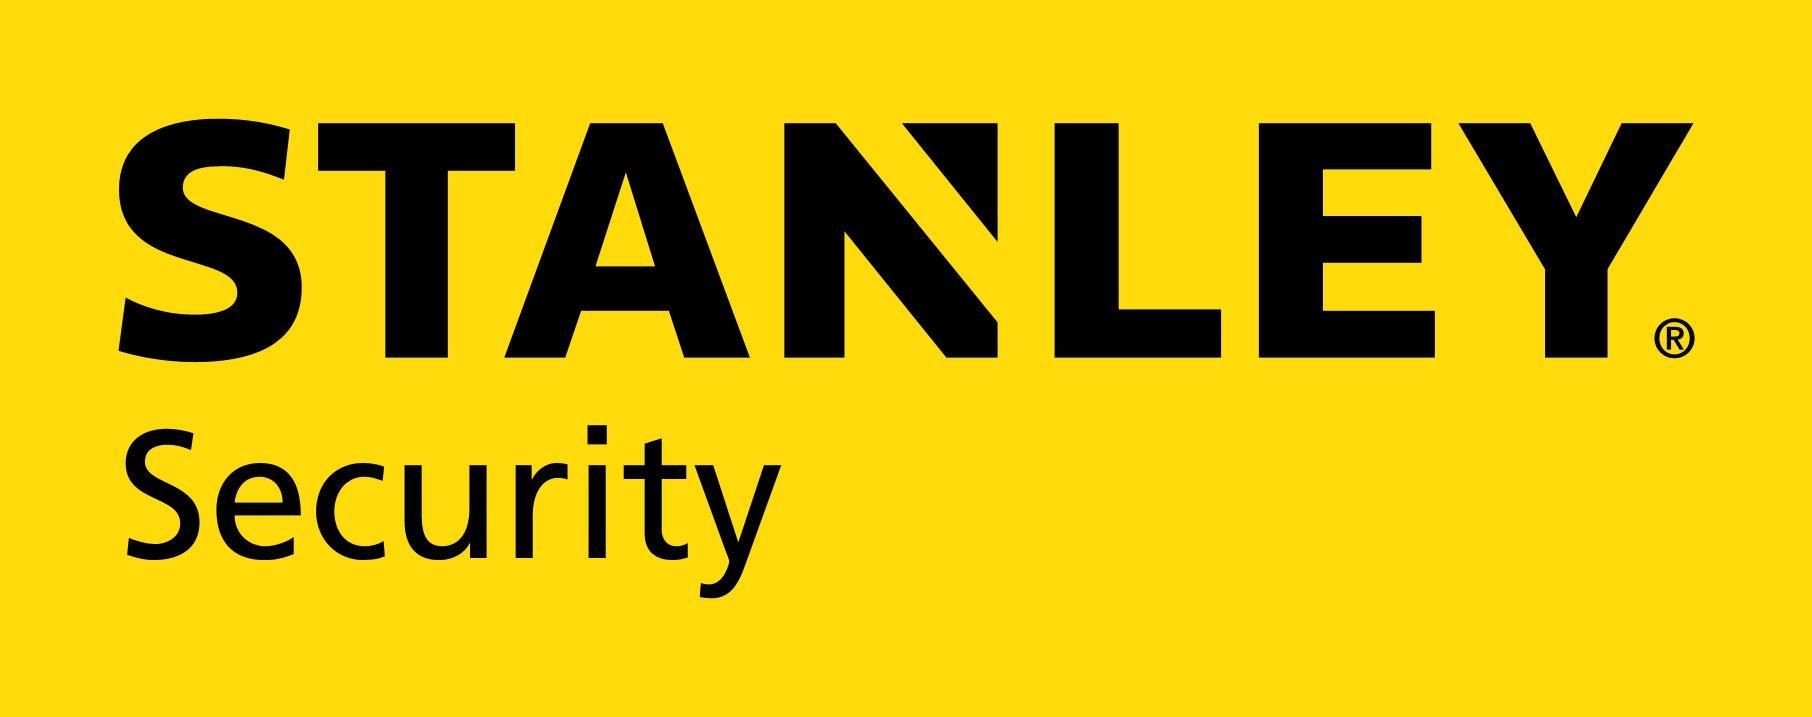 Larmbolaget Stanley Securitys logotyp